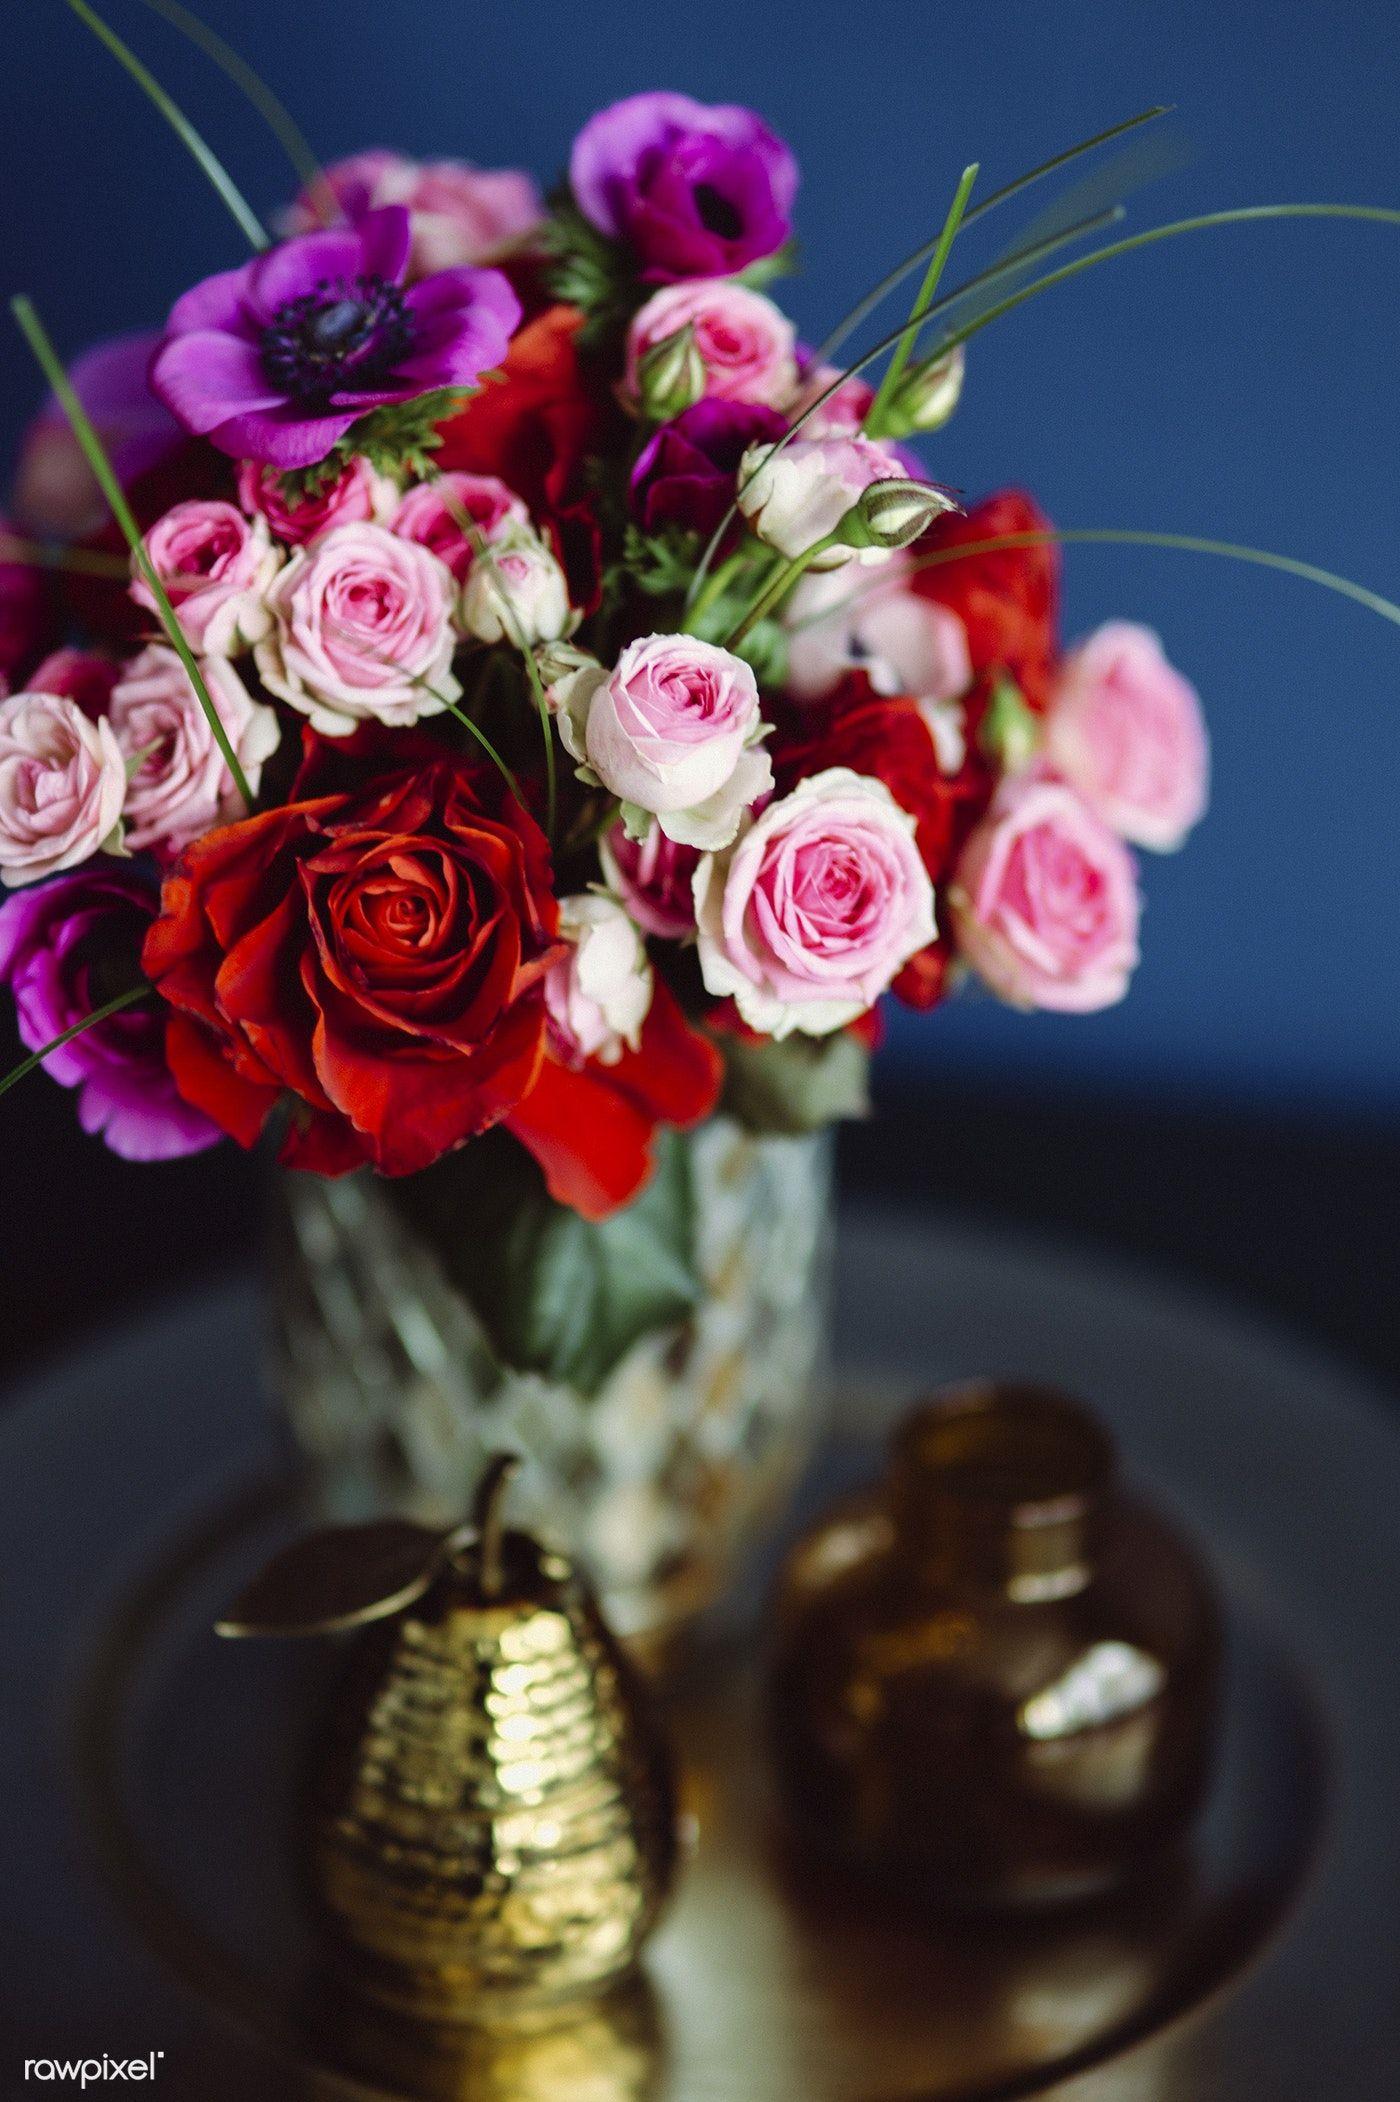 A beautiful bouquet of flowers free image by rawpixel a beautiful bouquet of flowers free image by rawpixel karolina kaboompics izmirmasajfo